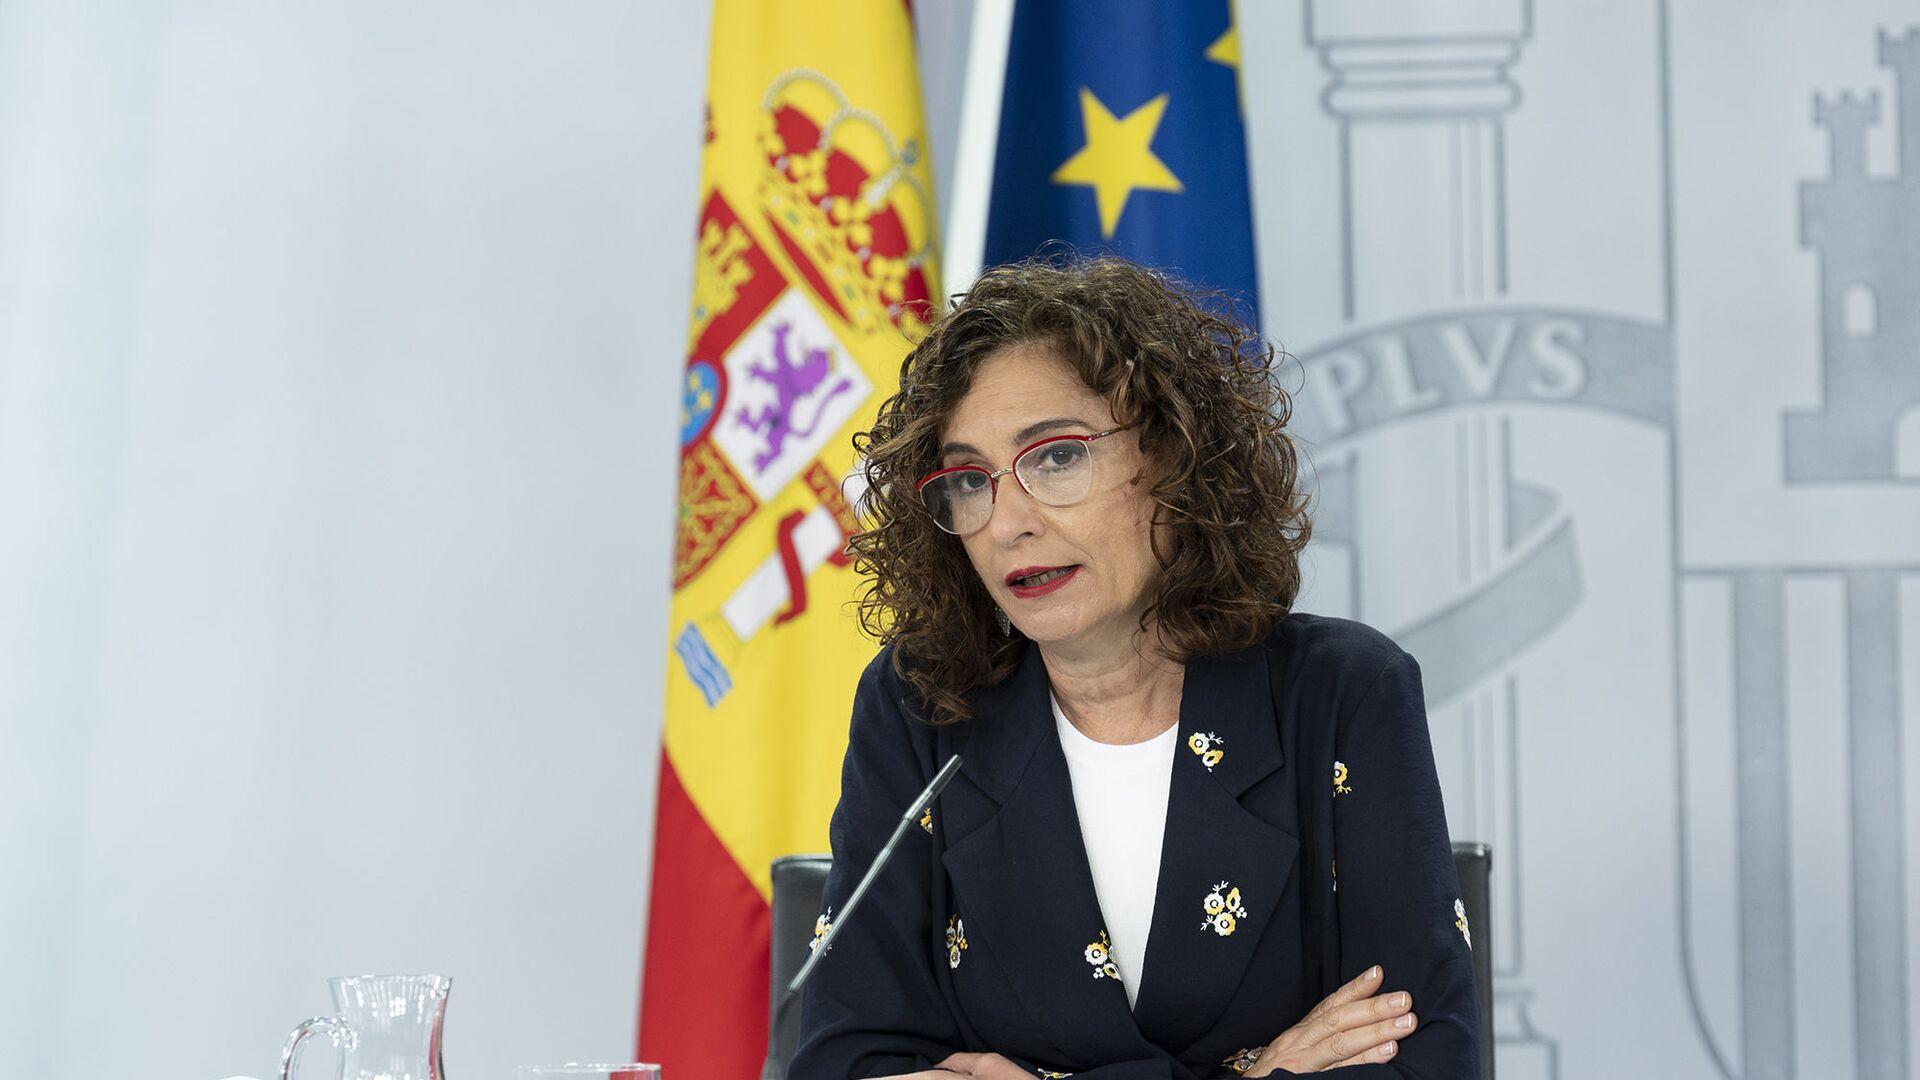 La ministra portavoz María Jesús Montero en una rueda de prensa - Sputnik Mundo, 1920, 30.04.2021